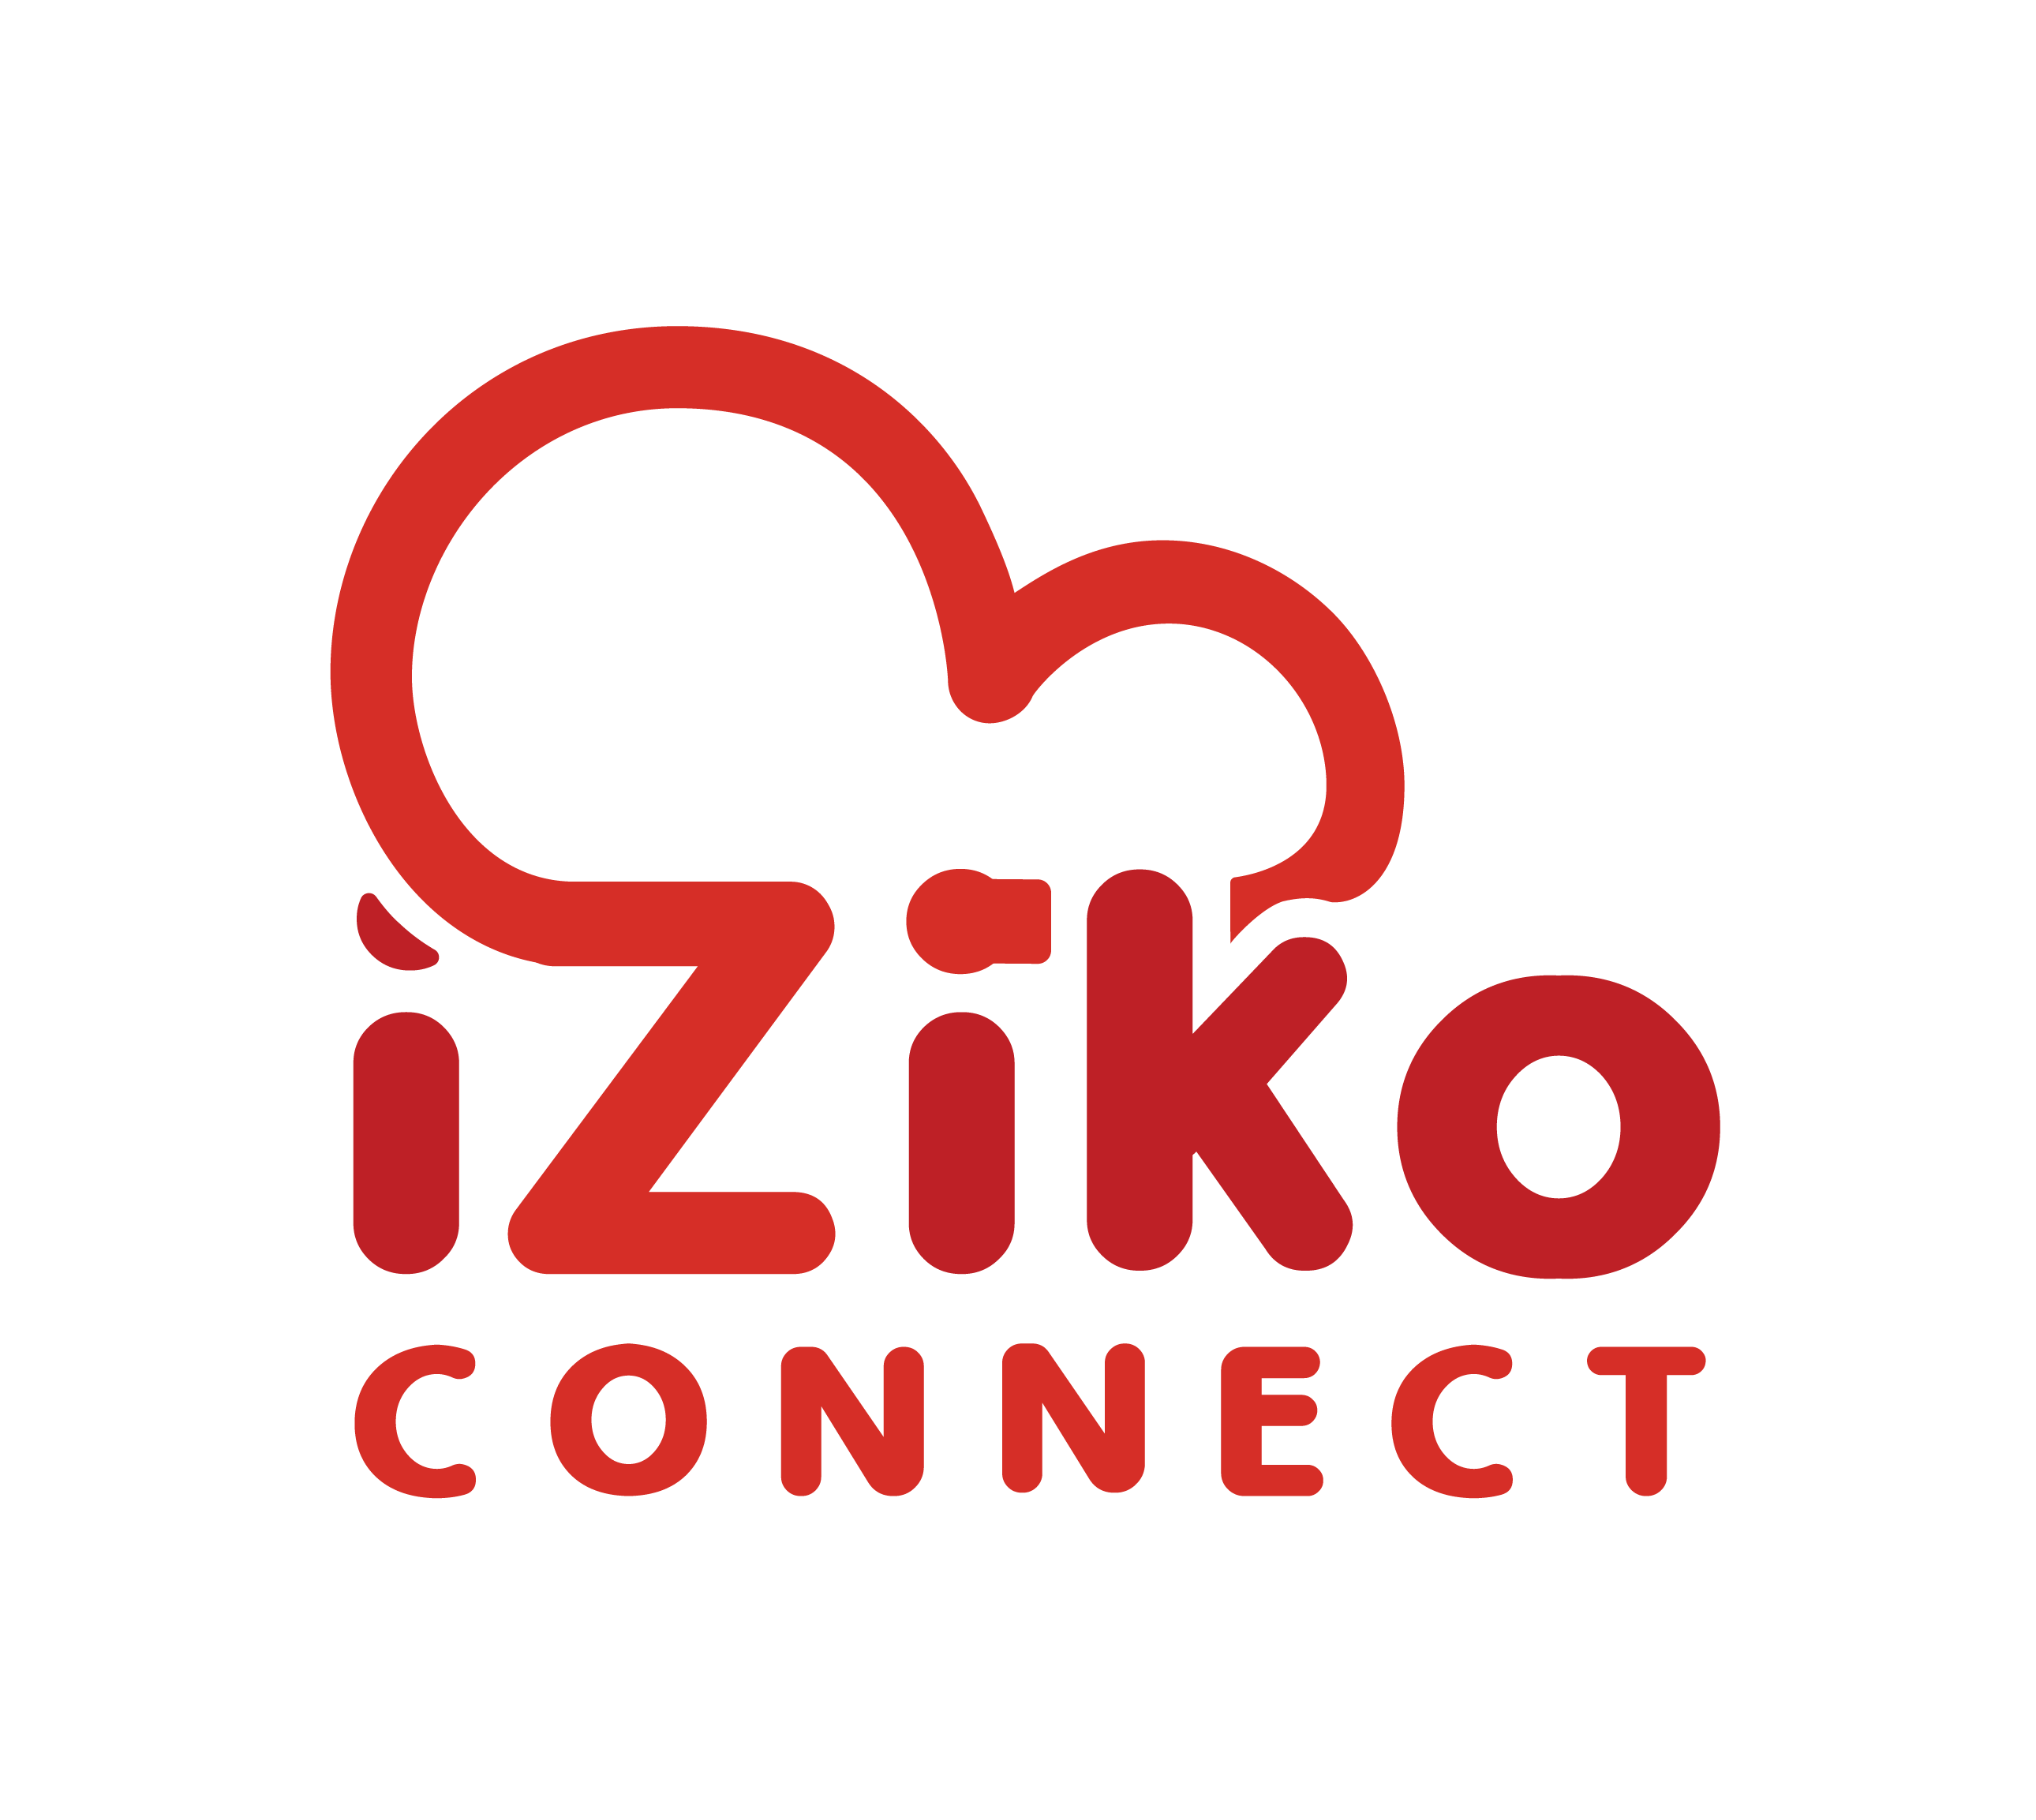 Iziko Connect